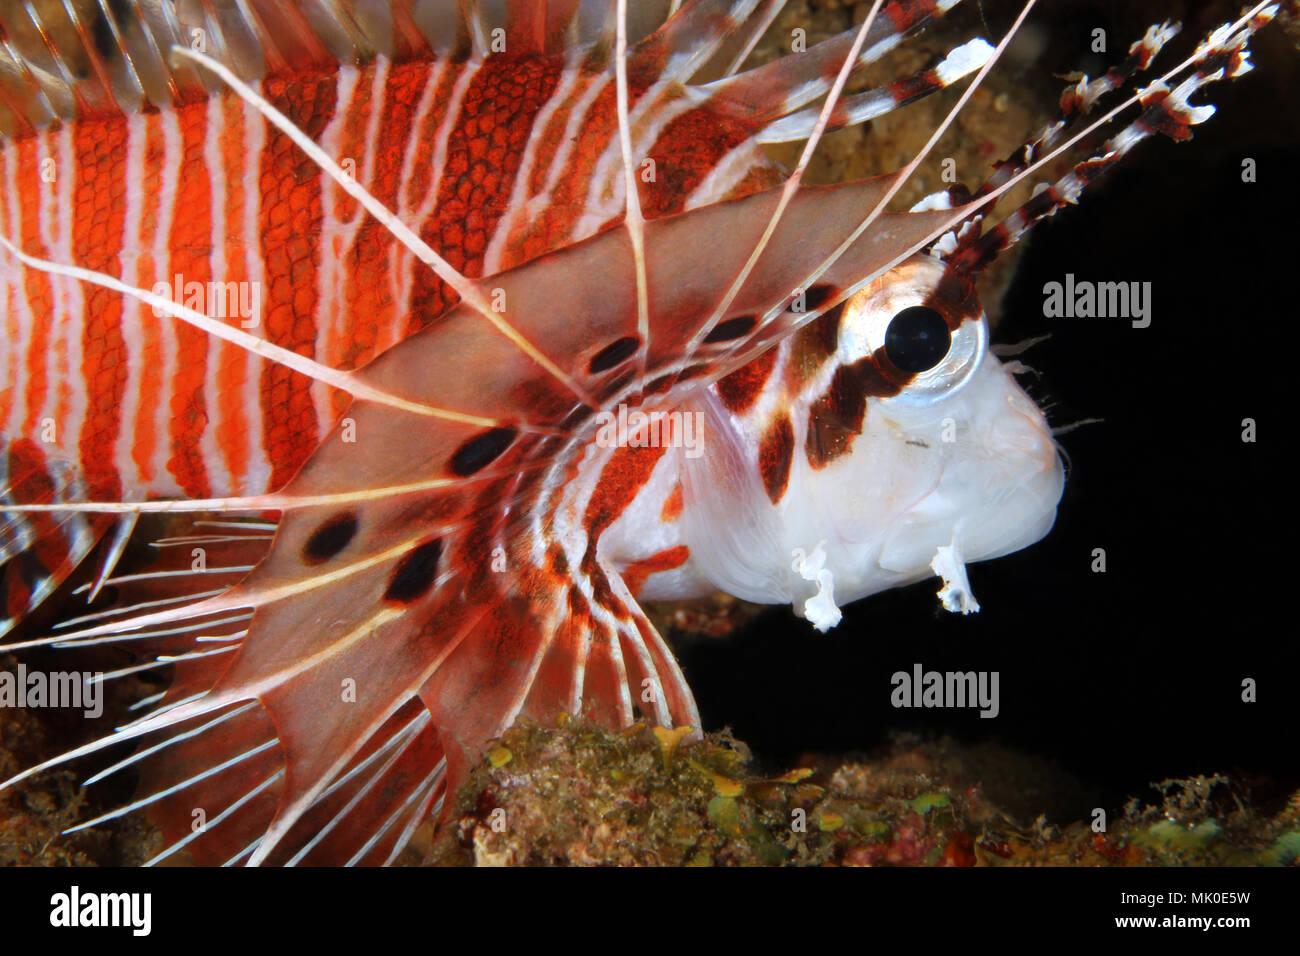 Spotfin Lionfish Close-up (Pterois antennata). Anilao, Philippines - Stock Image